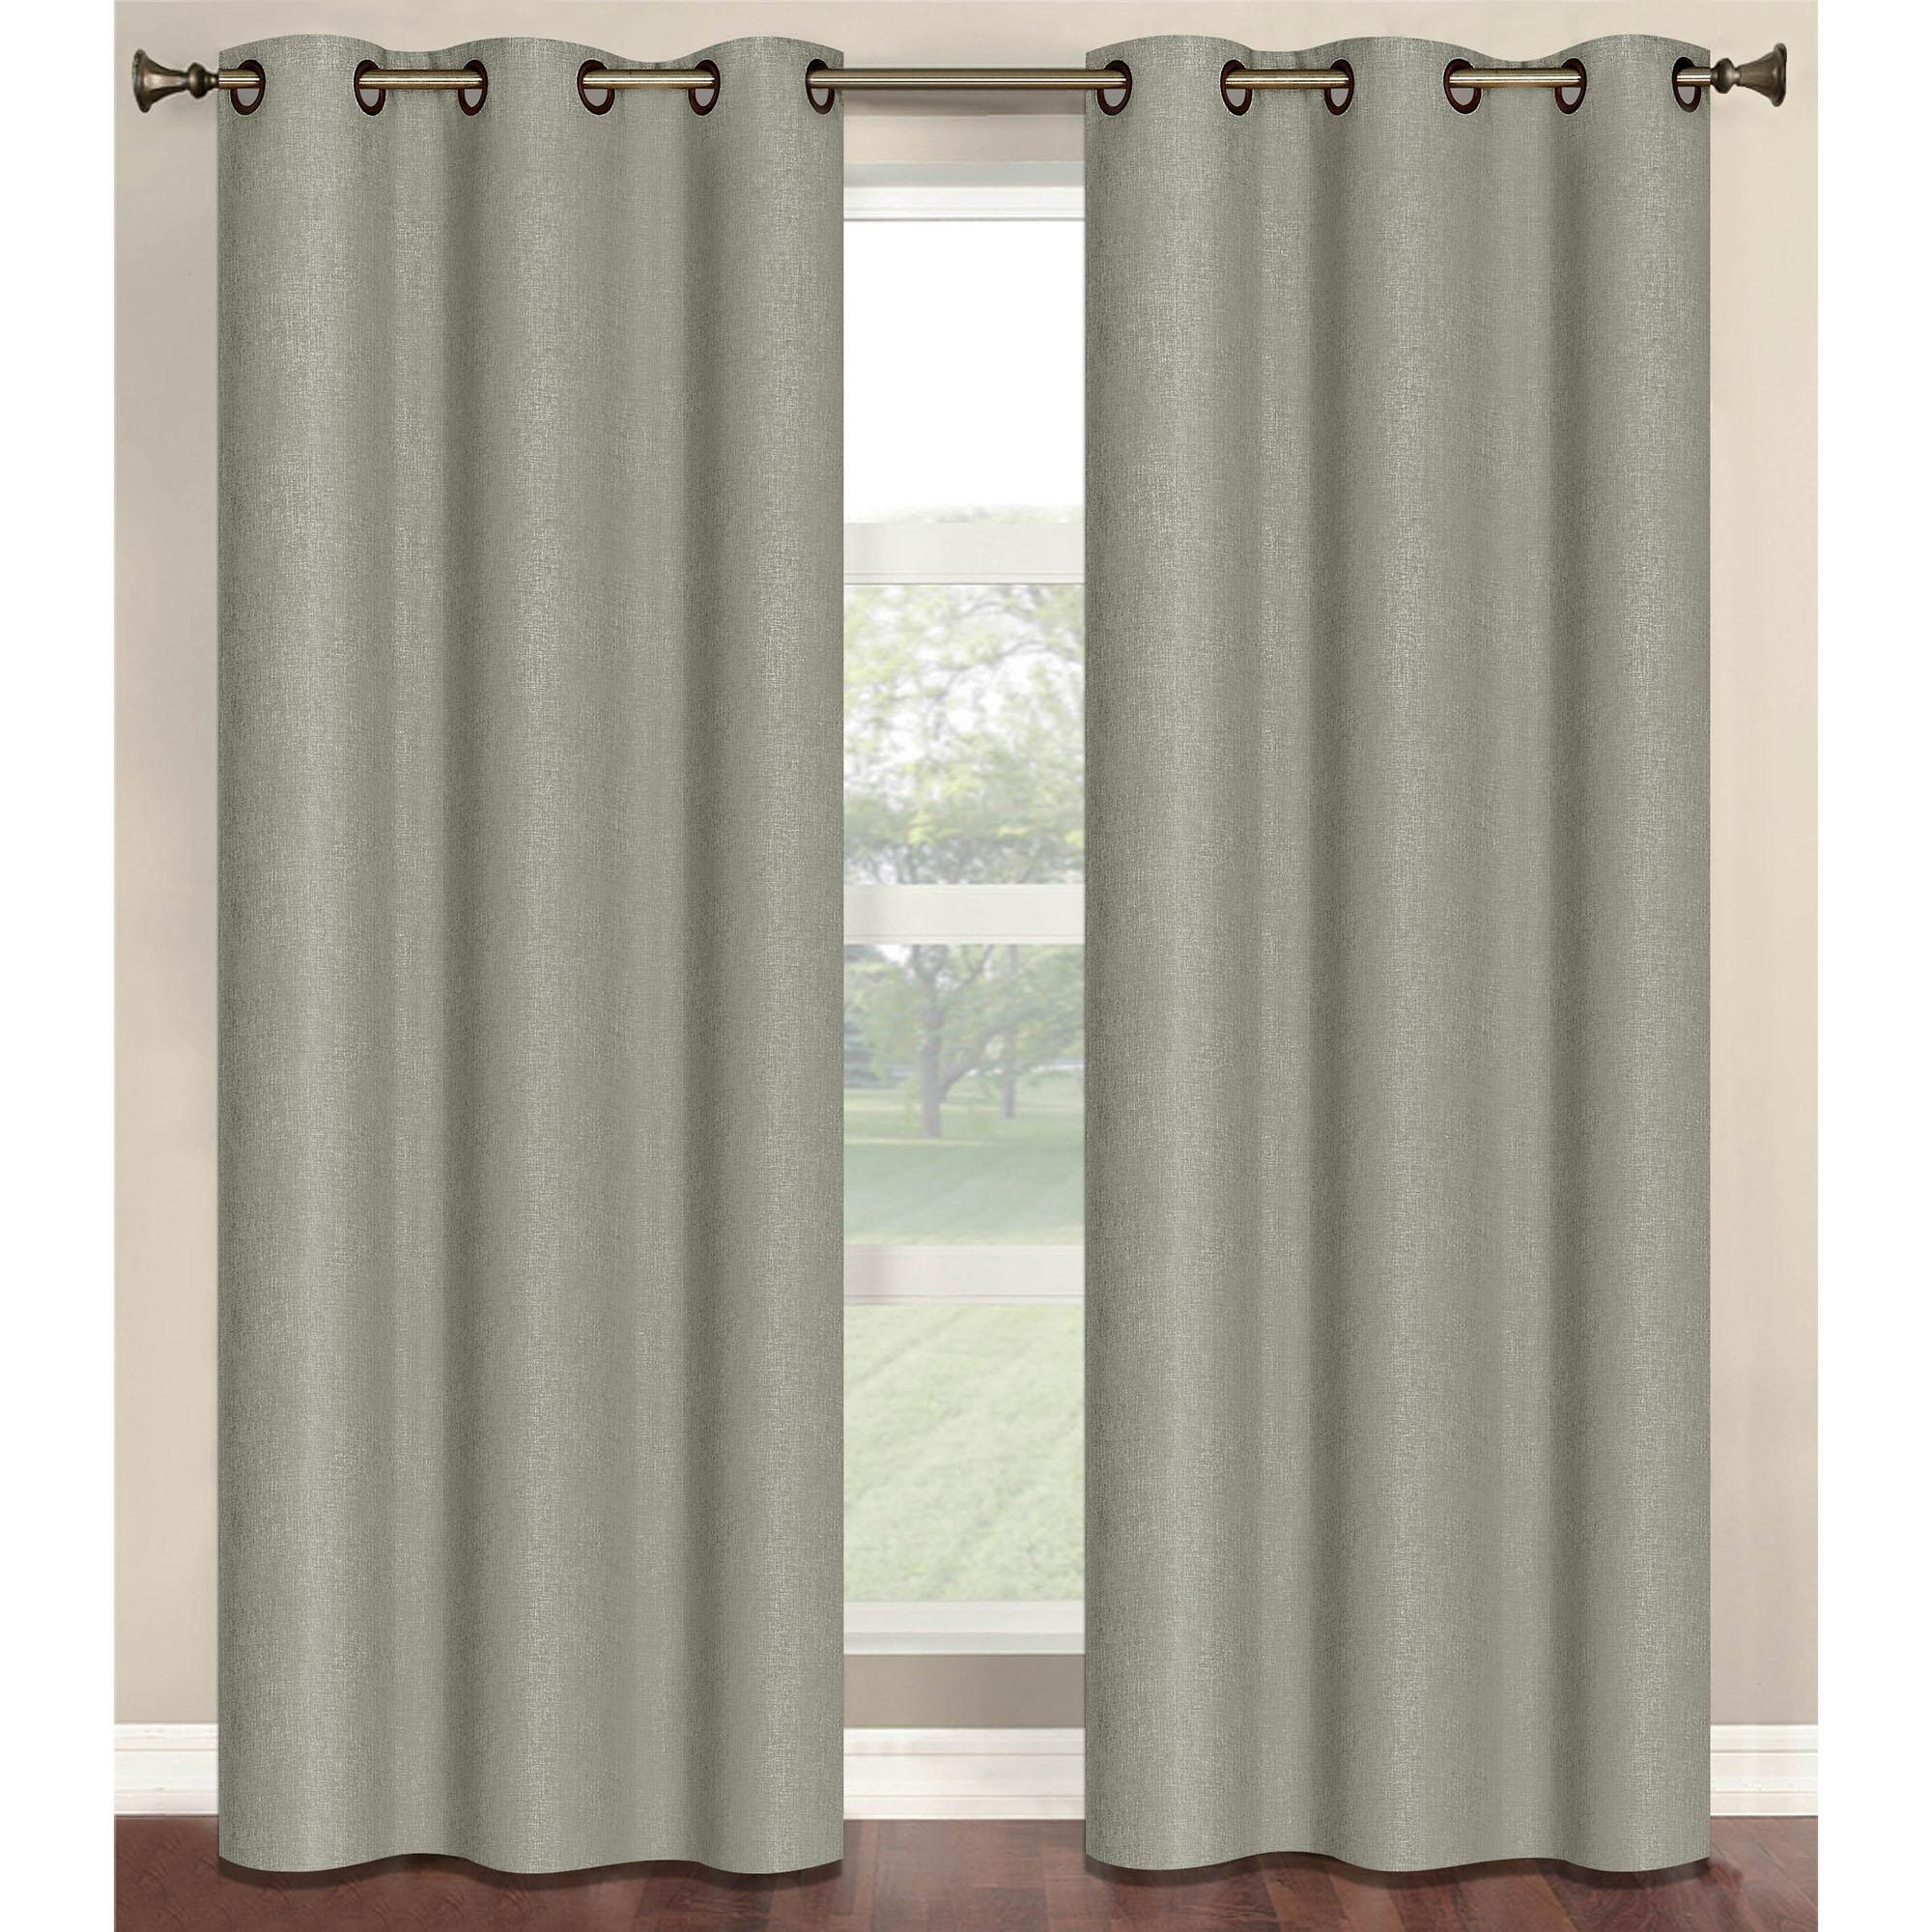 "Marina Faux Linen Room Darkening 76"" x 84"" Grommet Curtain Panel Pair"